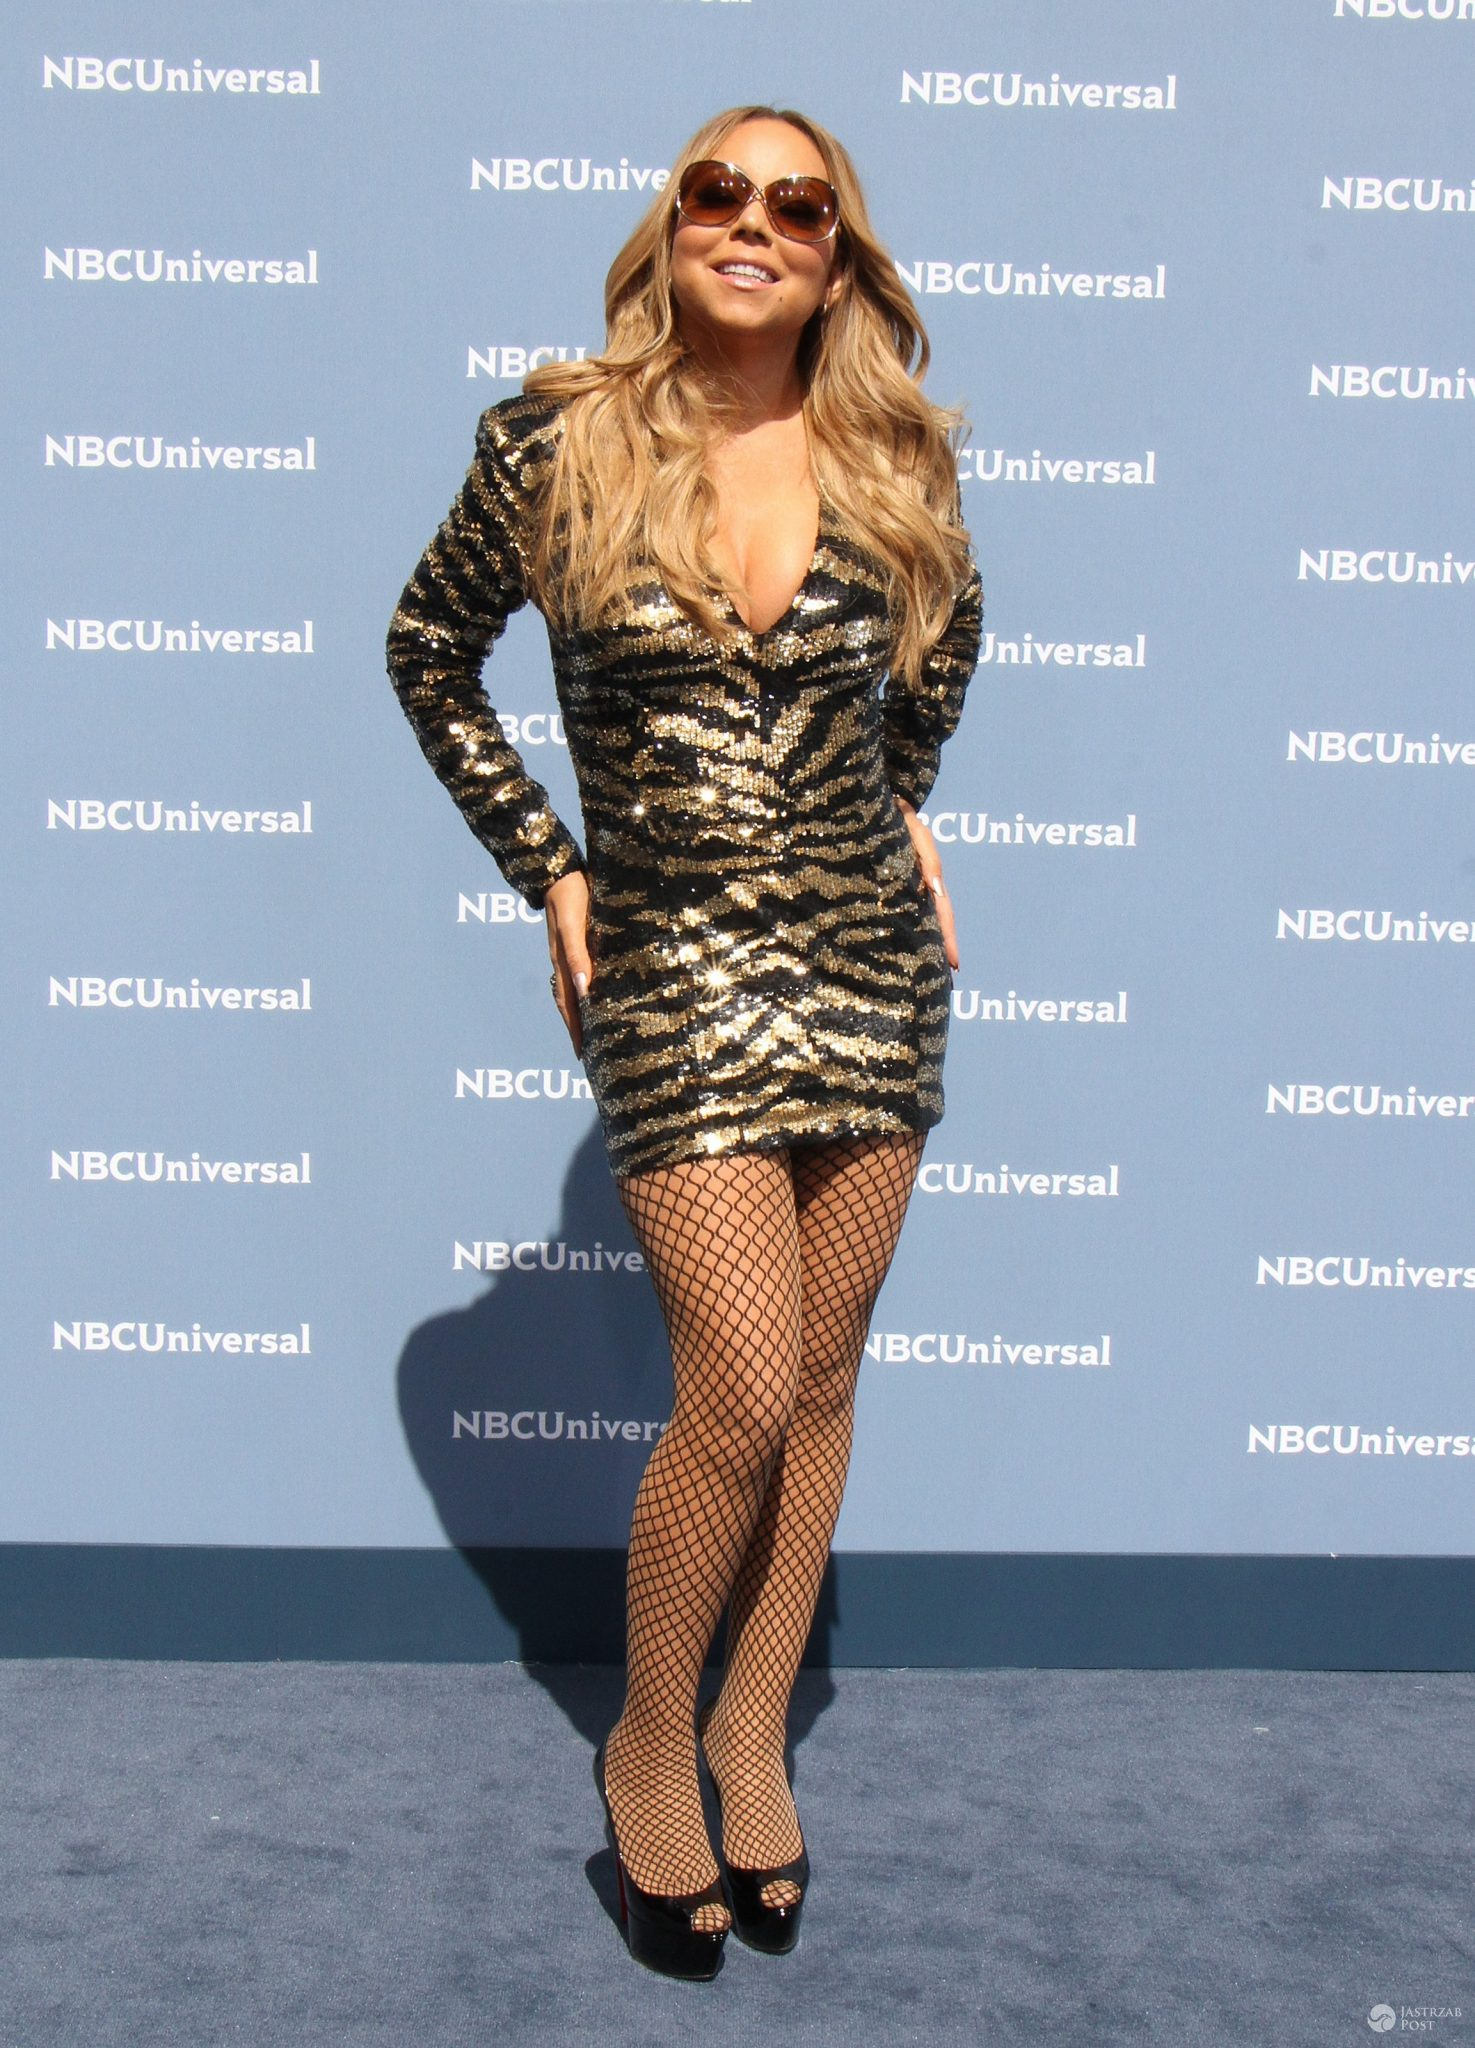 Mariah Carey, NBCUniversal 2016 Upfront (fot. ONS)